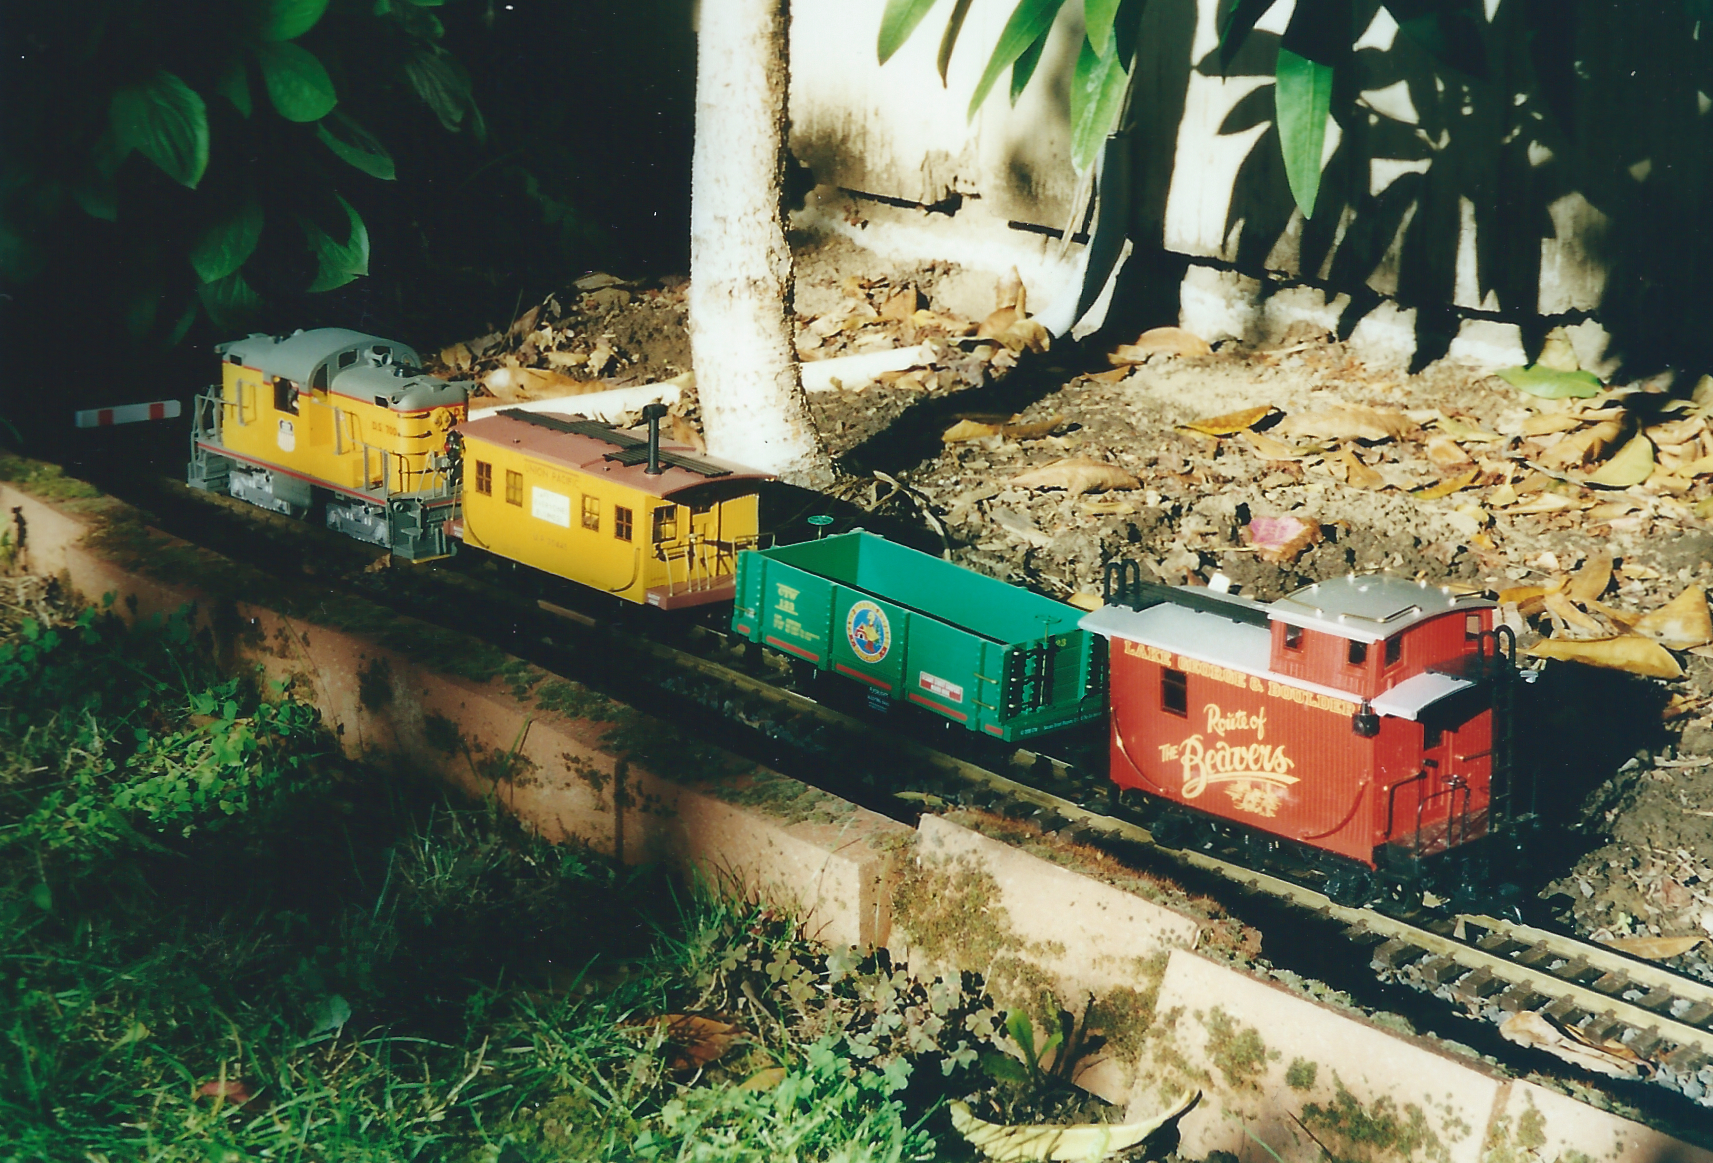 Garden Railway, 2816 SE Clay